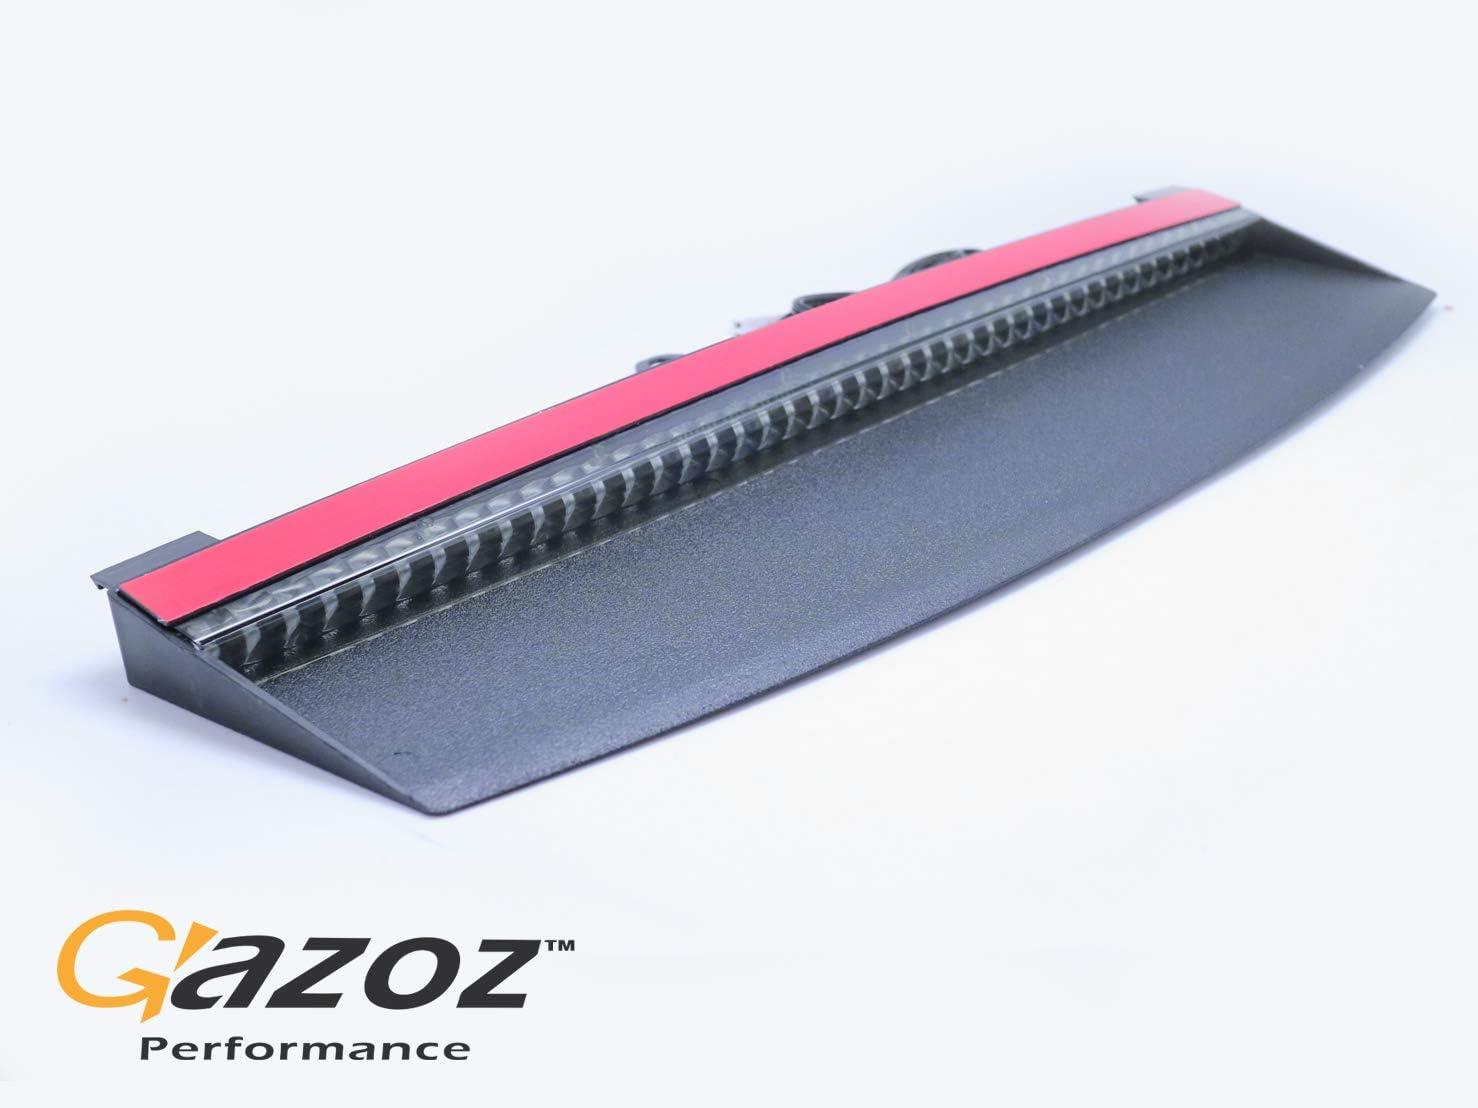 GAZOZ PERFORMANCE LED 3rd Third Brake Hight Mount Light for 2012-16 Scion FRS FR-S Toyota GT86 BRZ